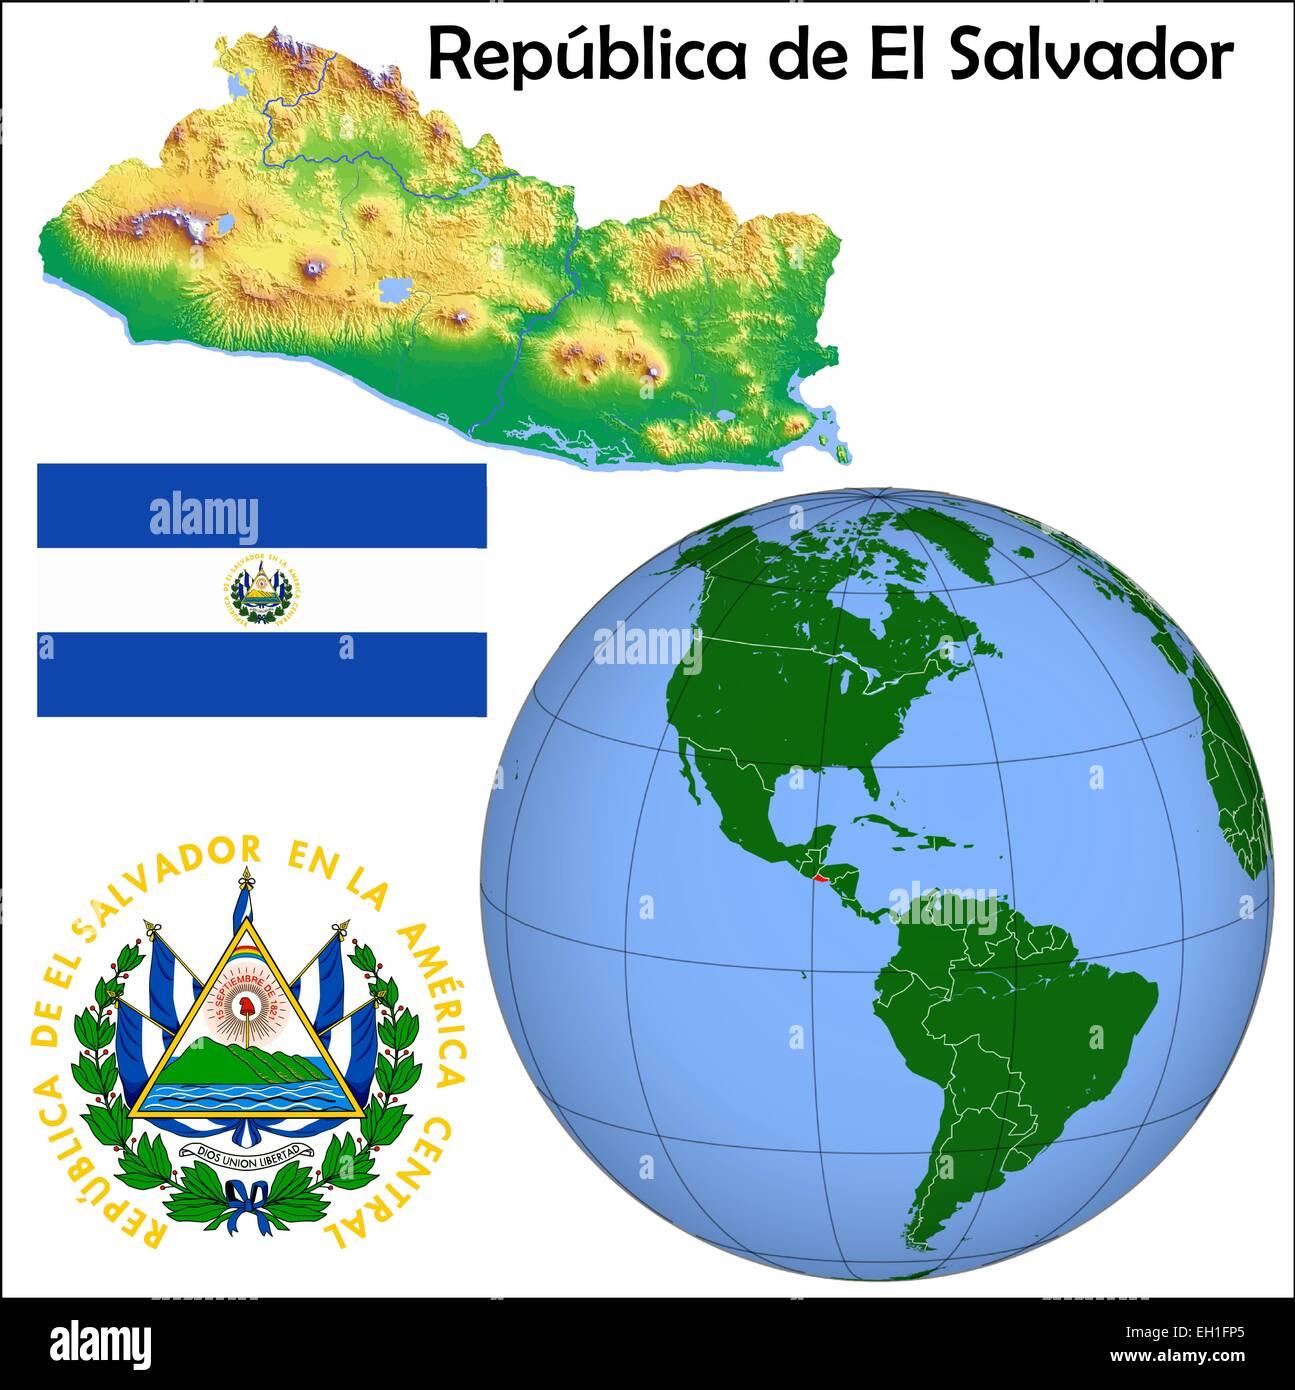 El Salvador Location In World Map Image Collections